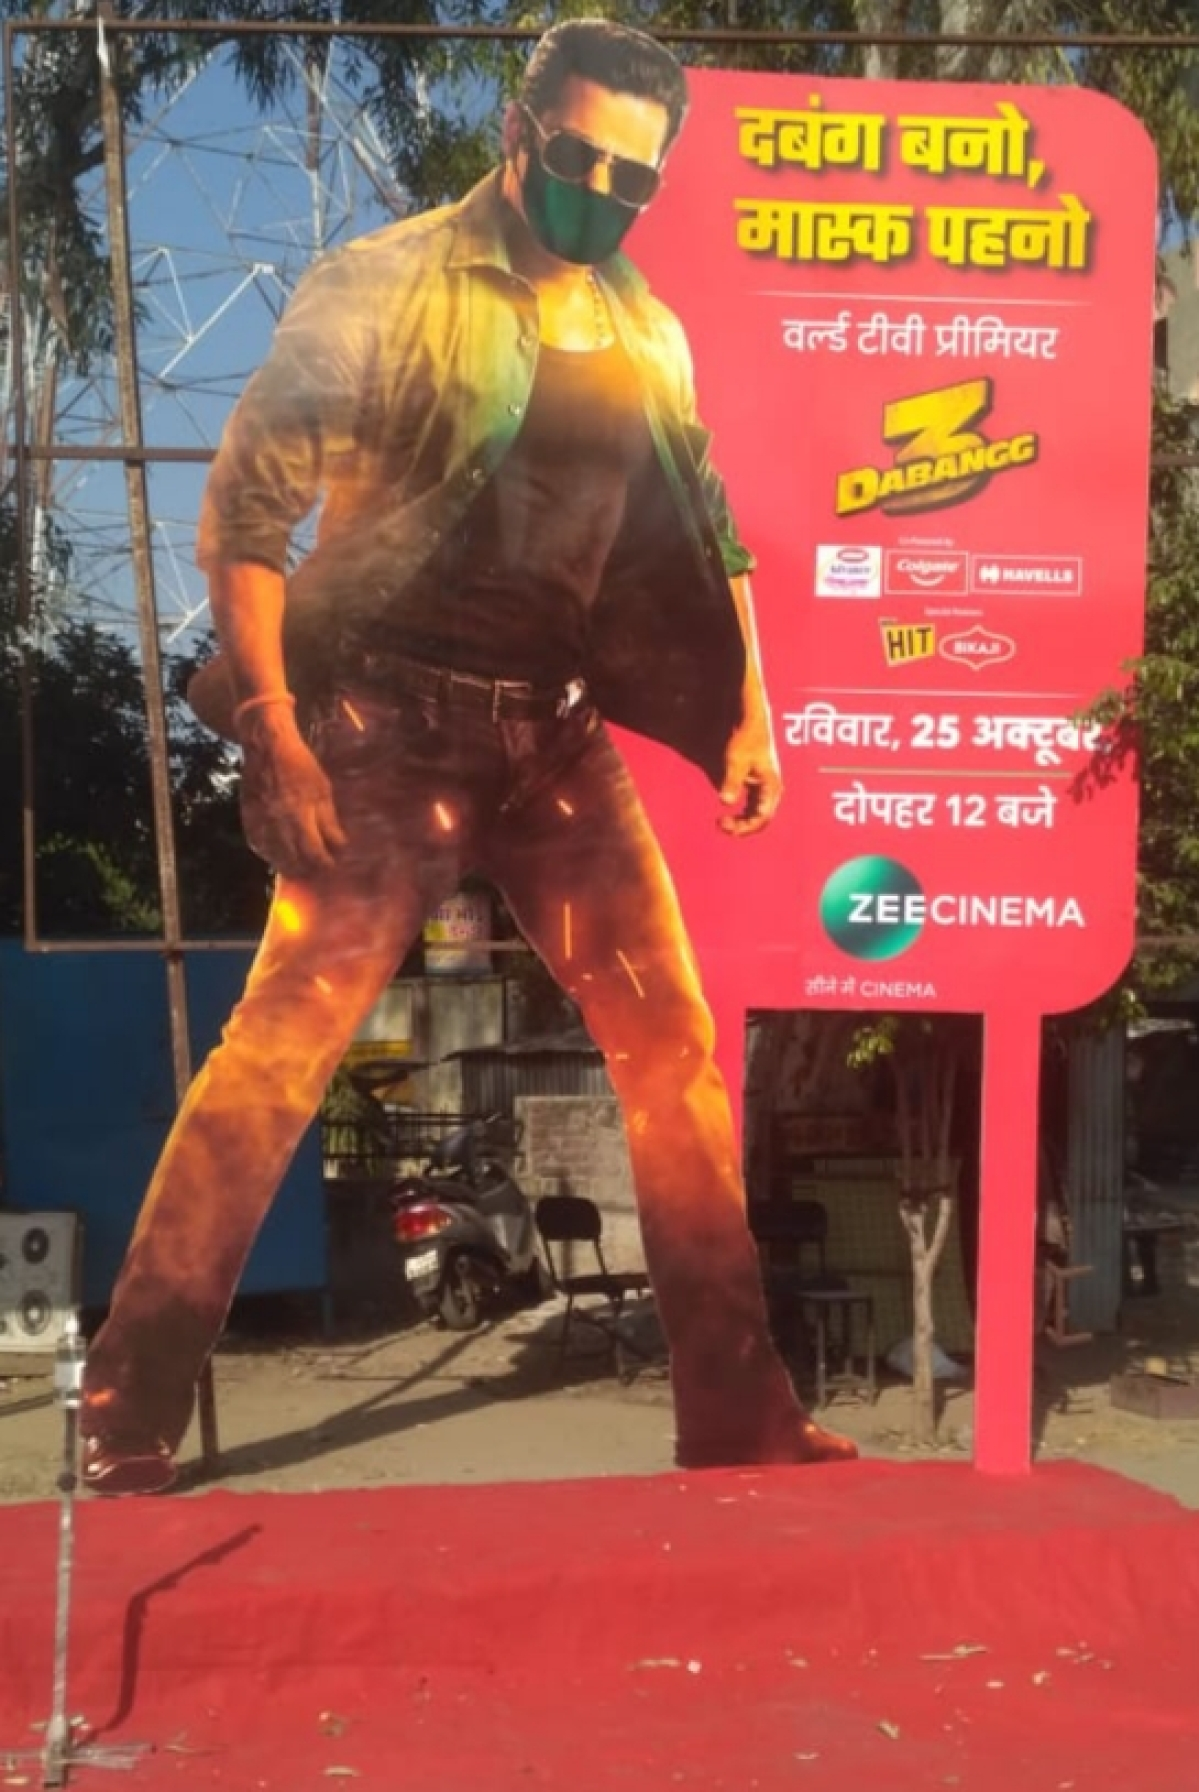 Zee Cinema promotes the World Television Premiere of Dabangg 3 with a  campaign #DabanggBanoMaskPehno